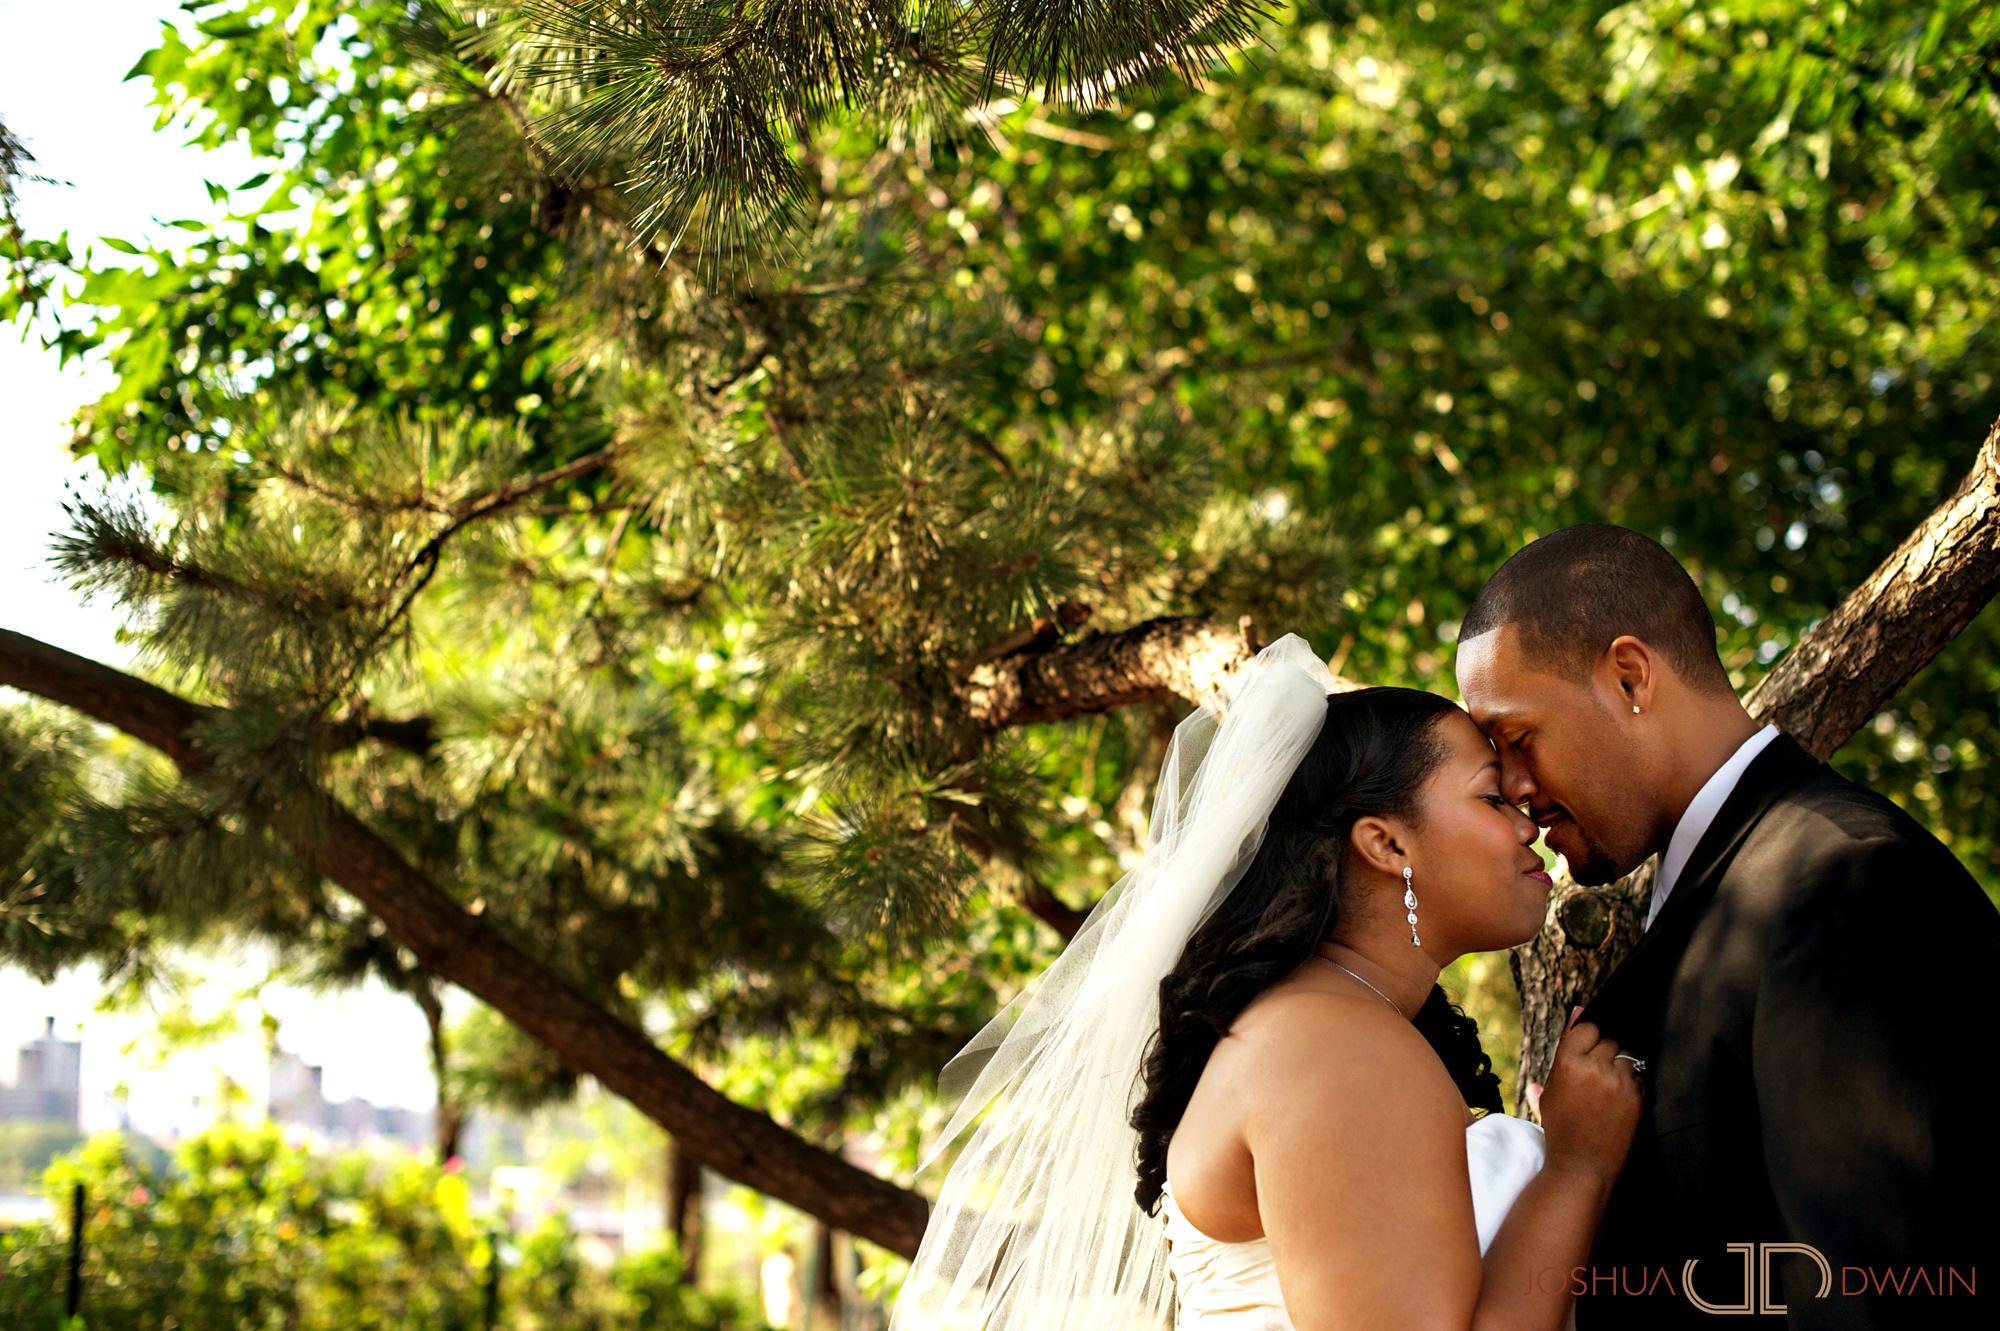 jessica-frank-001-giando-on-the-water-brooklyn-ny-wedding-photographer-joshua-dwain-2011-09-02_jf_245